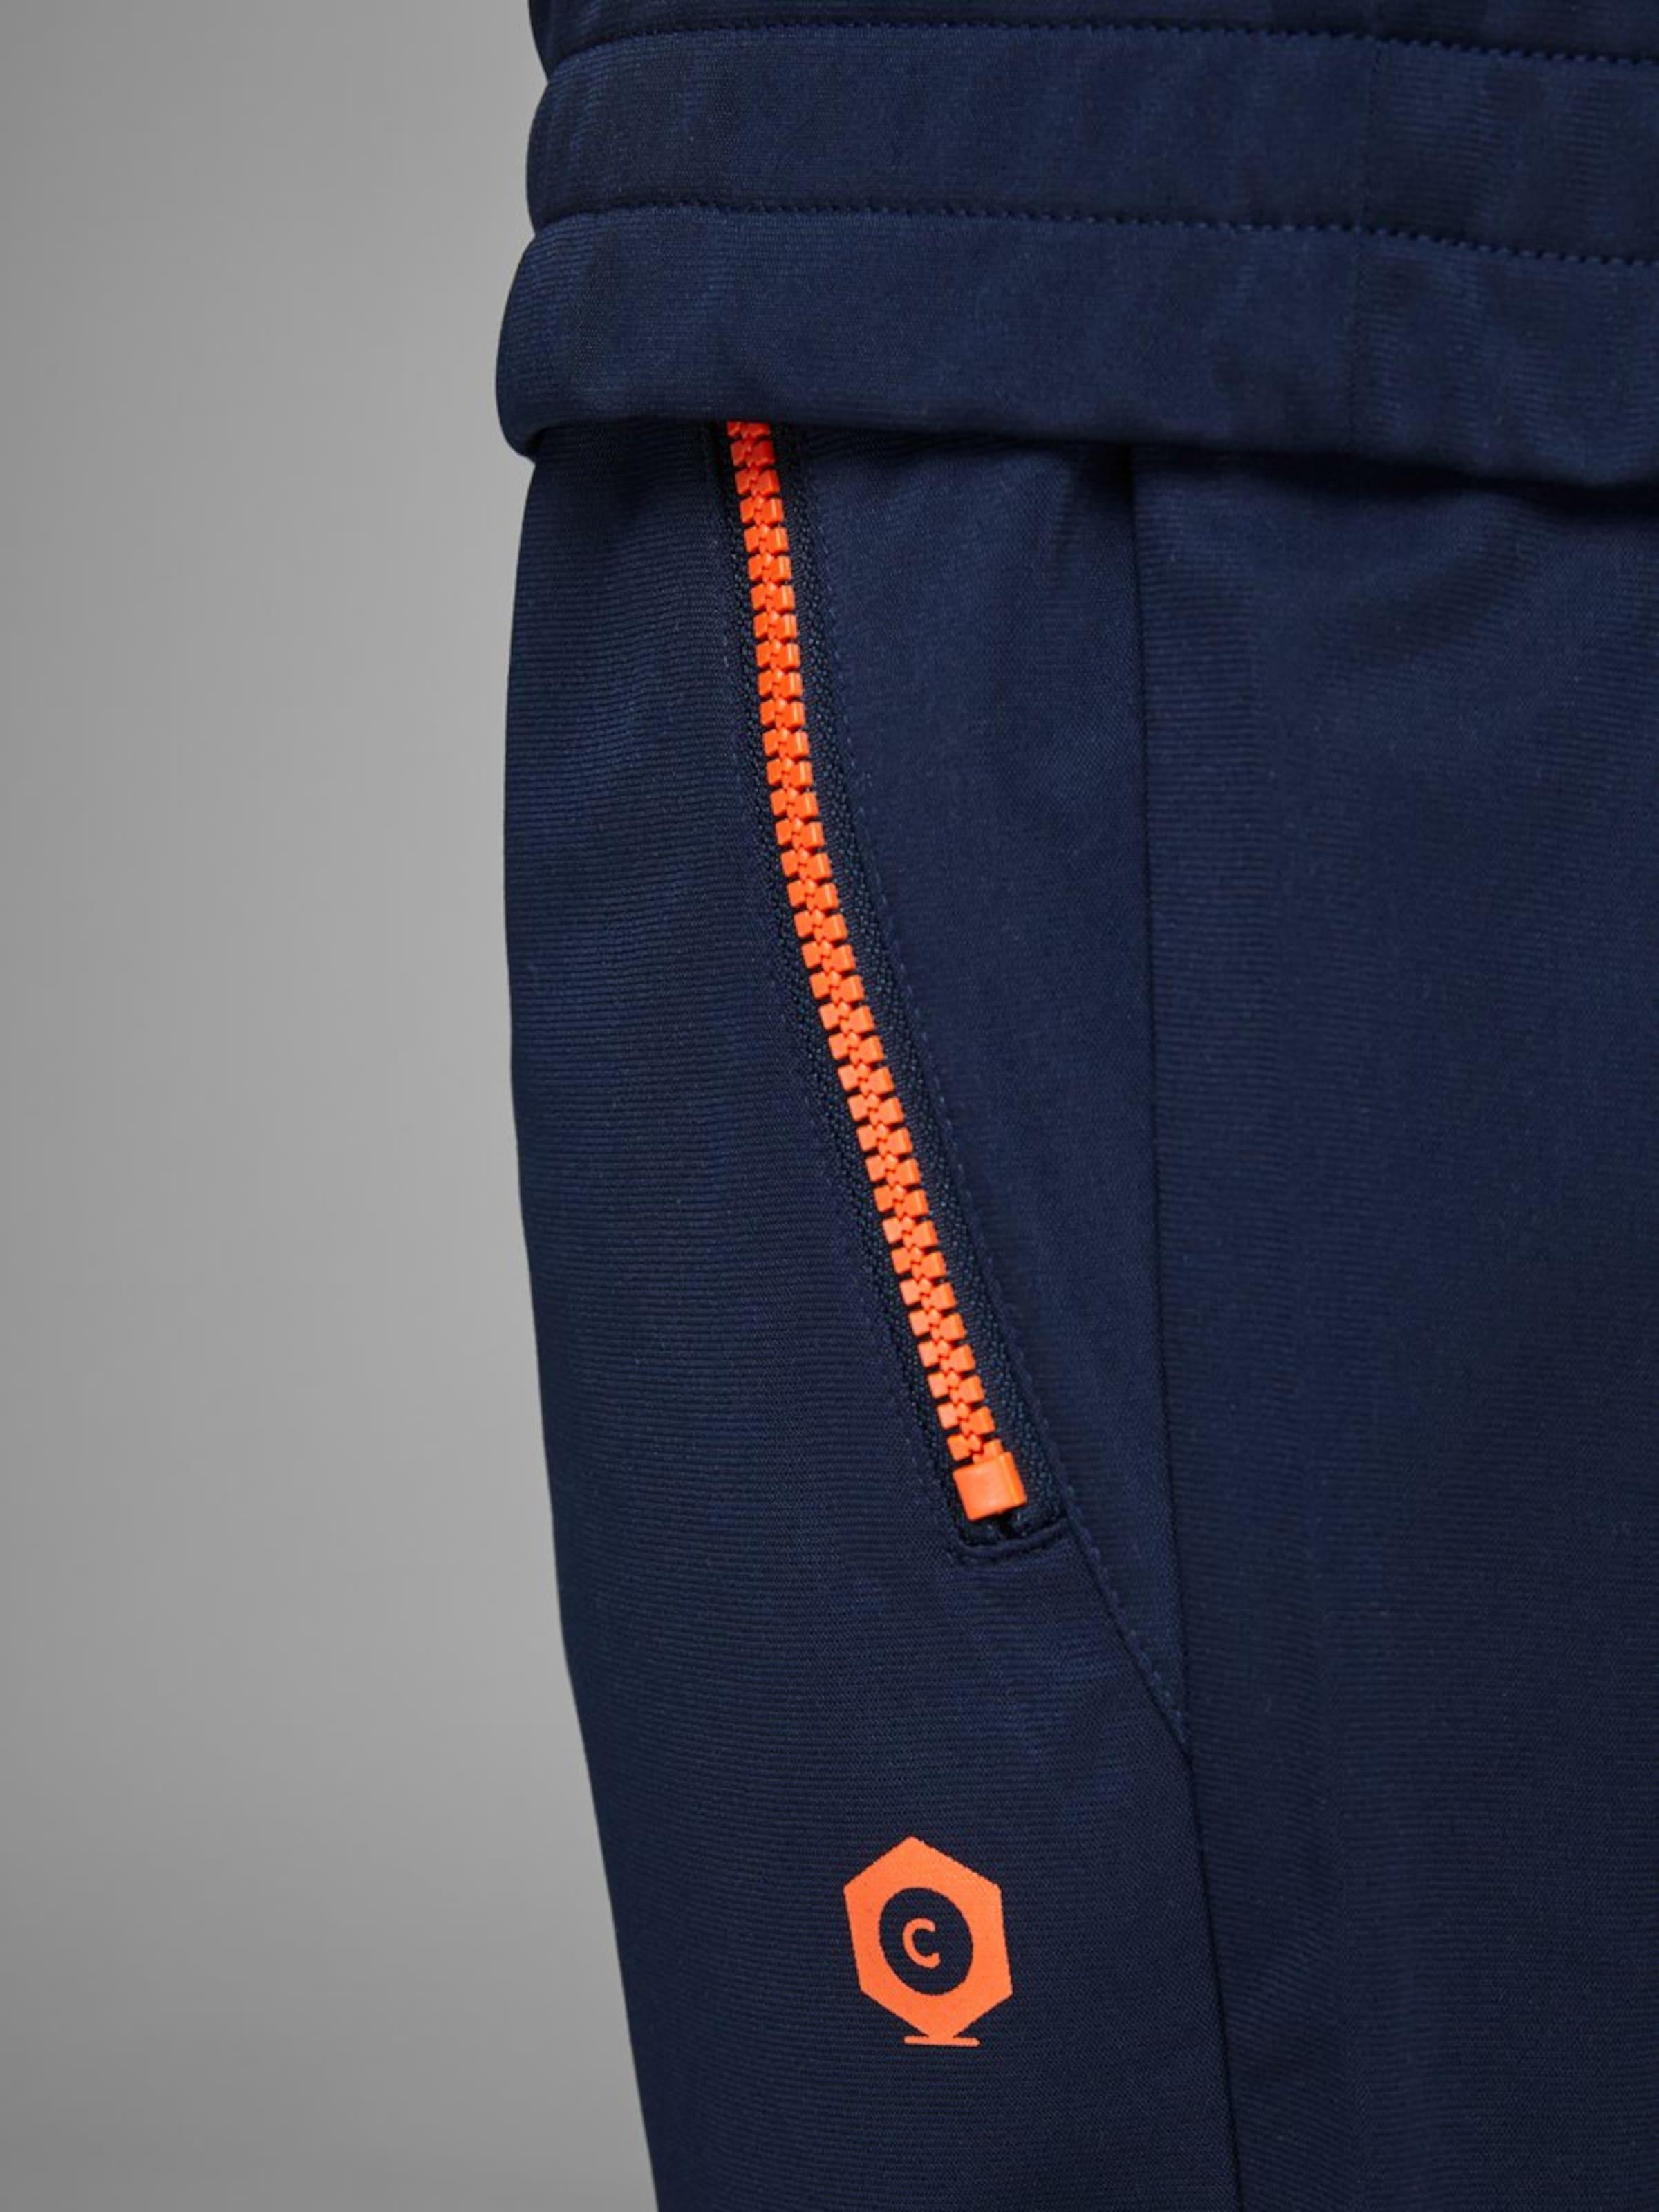 Bleu Jones NuitBlanc Jackamp; Pantalon En E2H9DI